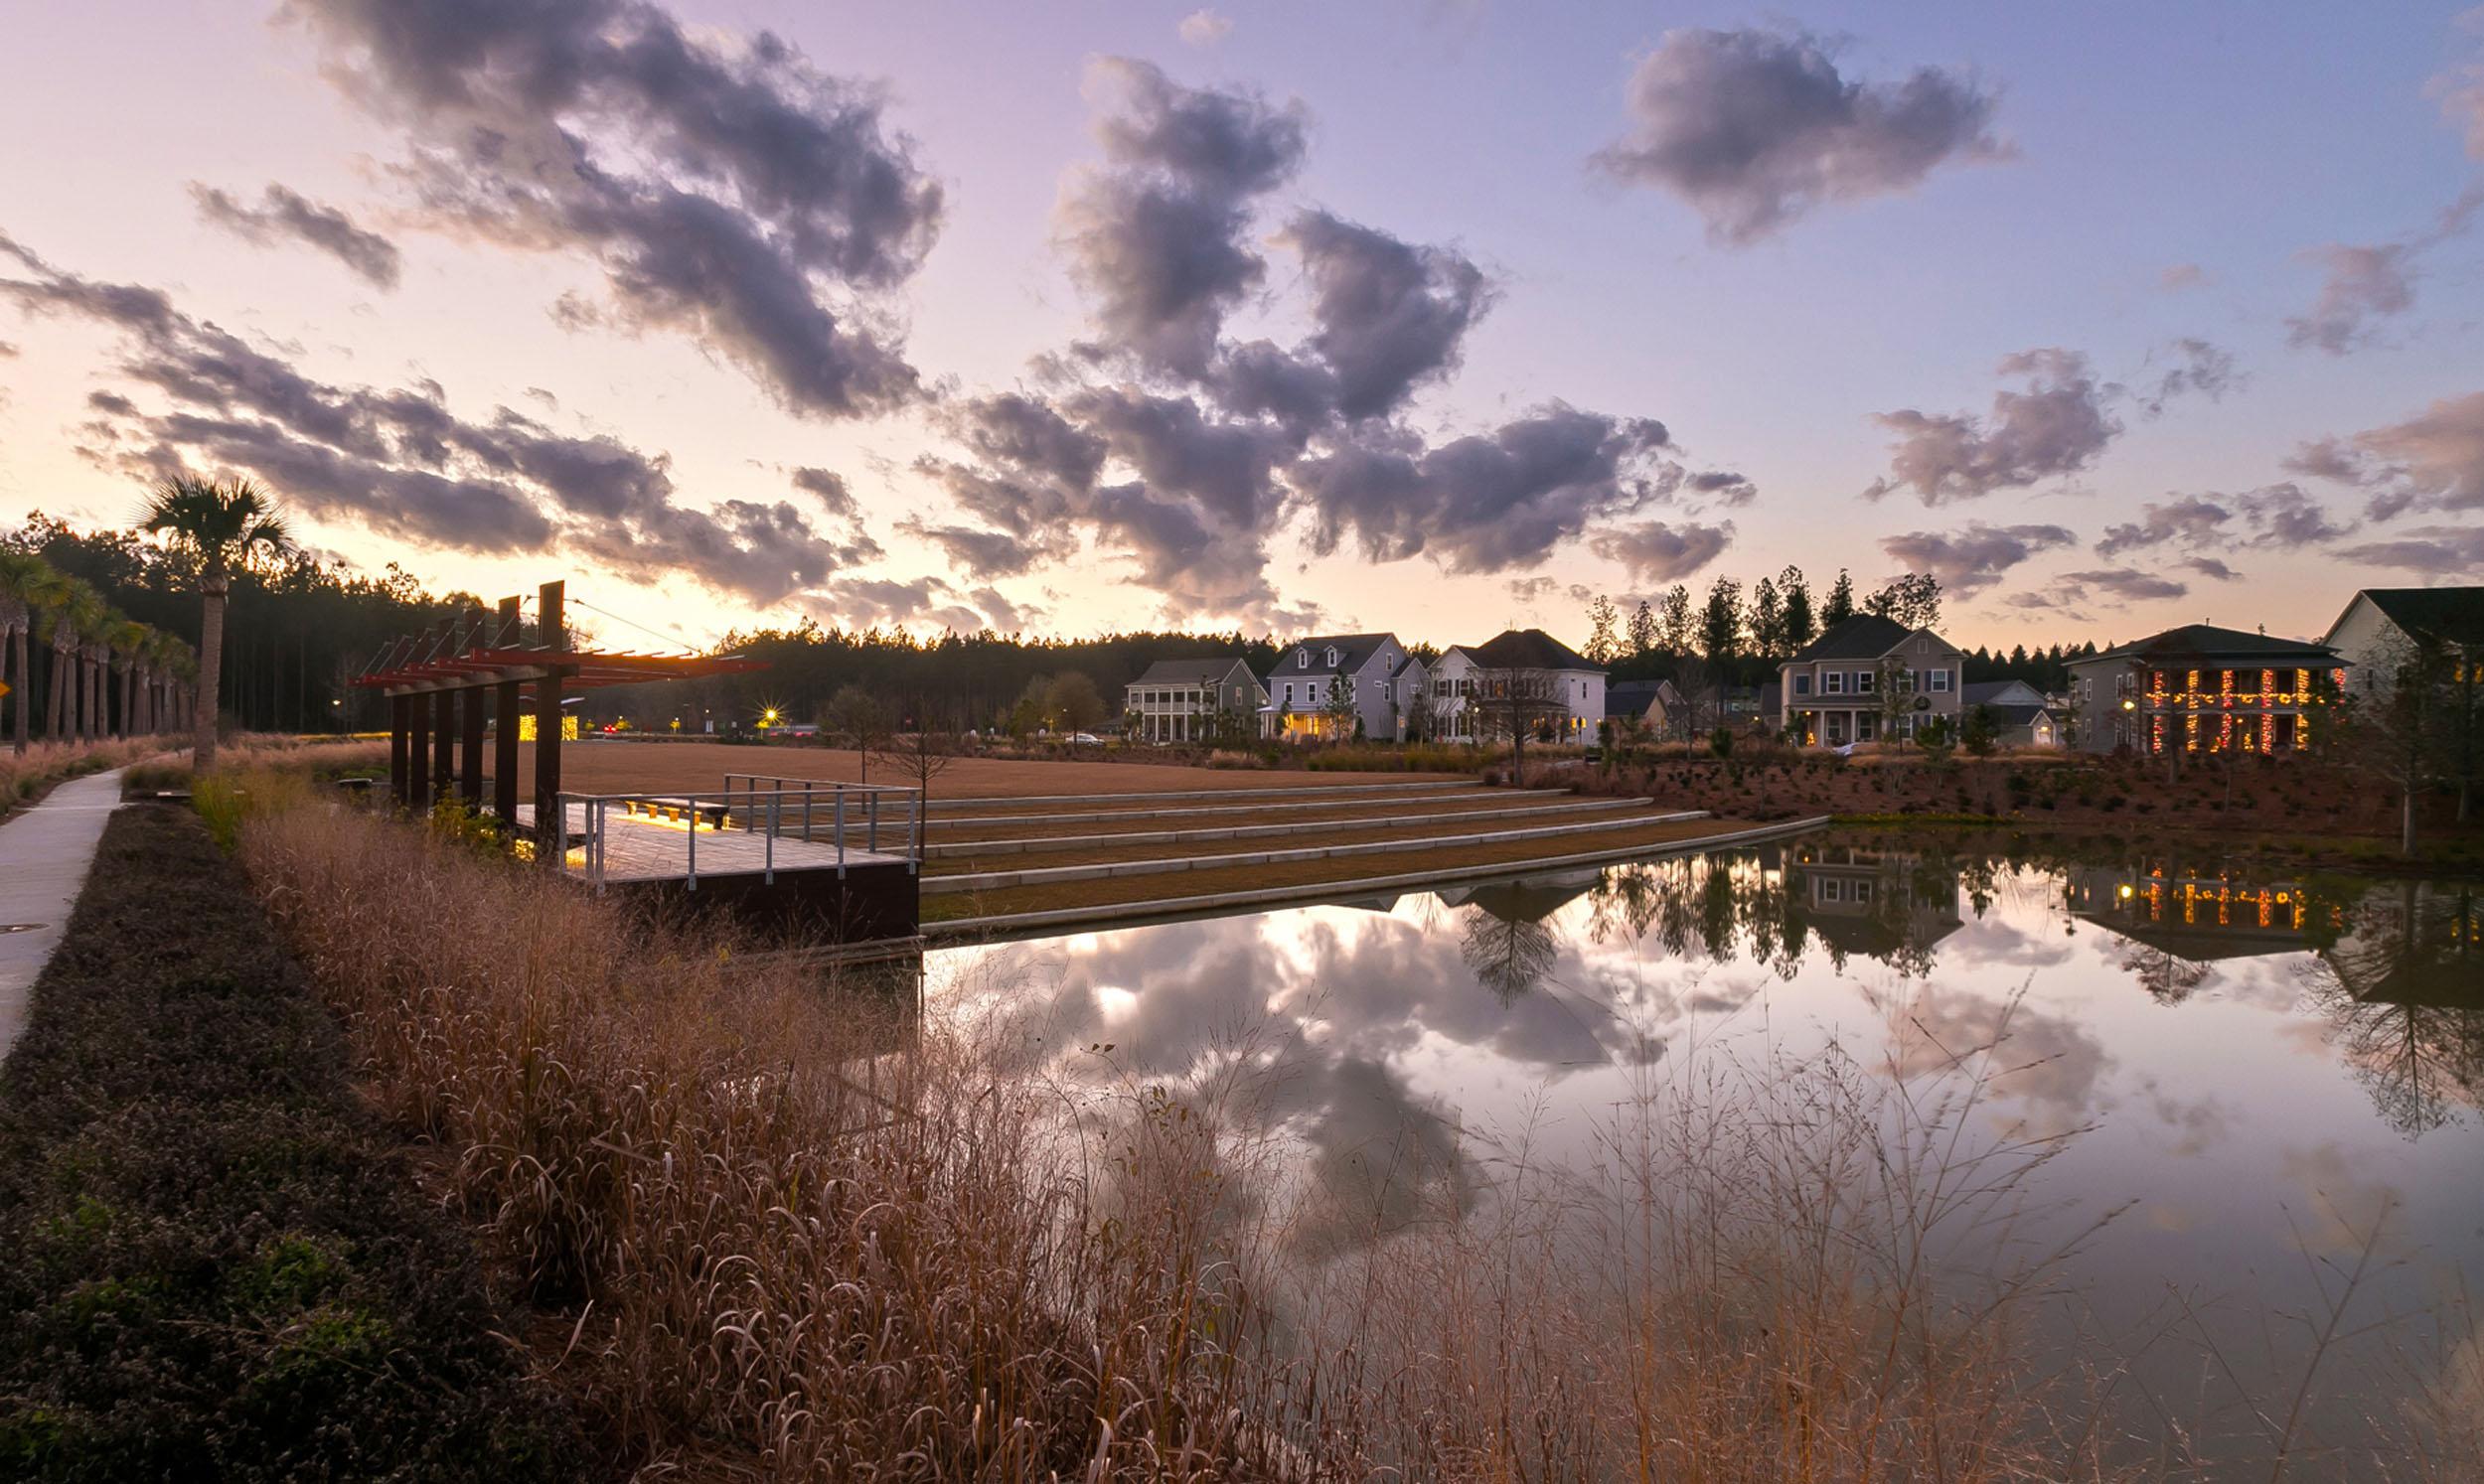 Brighton Park at Sunset